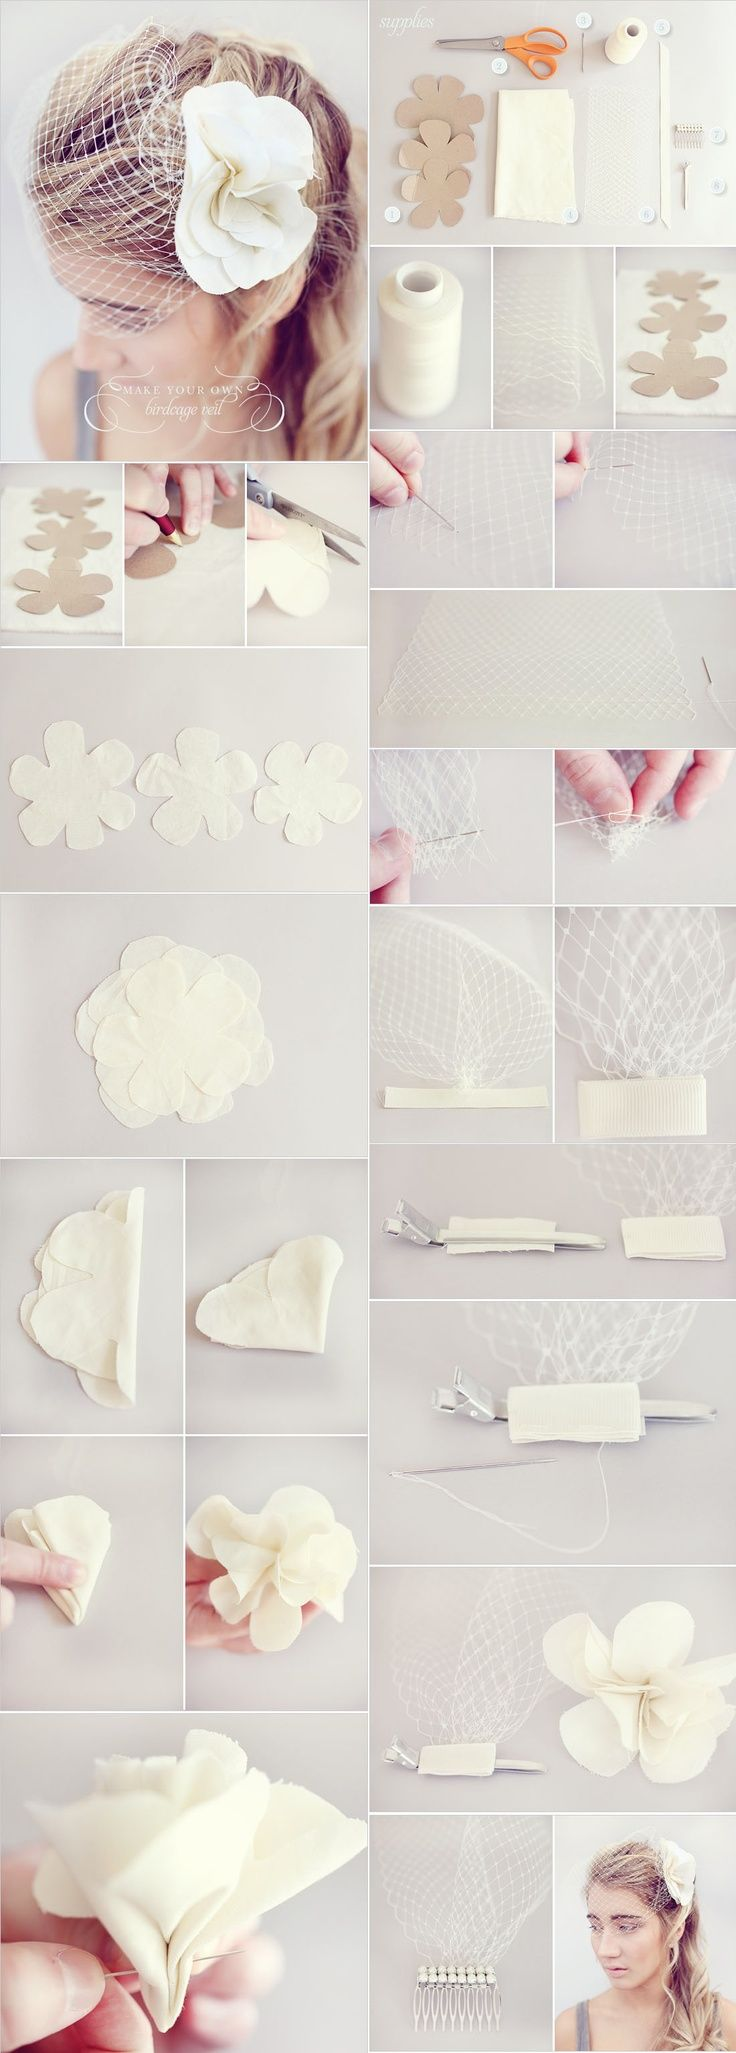 Beautiful Wedding DIYs using Fabric & Scraps